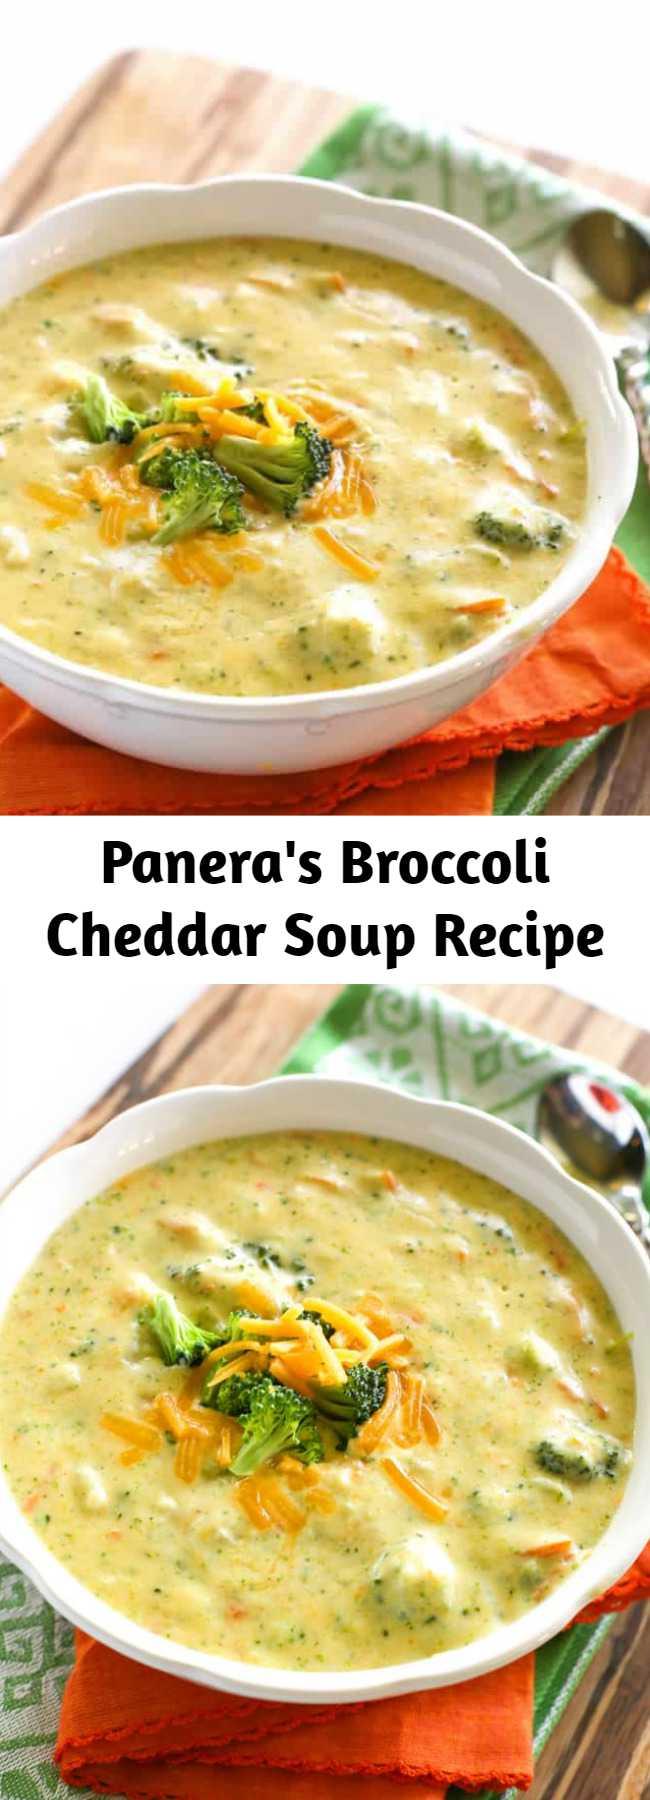 Panera's Broccoli Cheddar Soup Recipe - Creamy broccoli cheddar soup is comfort food at its best and this Panera's Broccoli Cheddar Soup is an easy dinner that hits the spot.